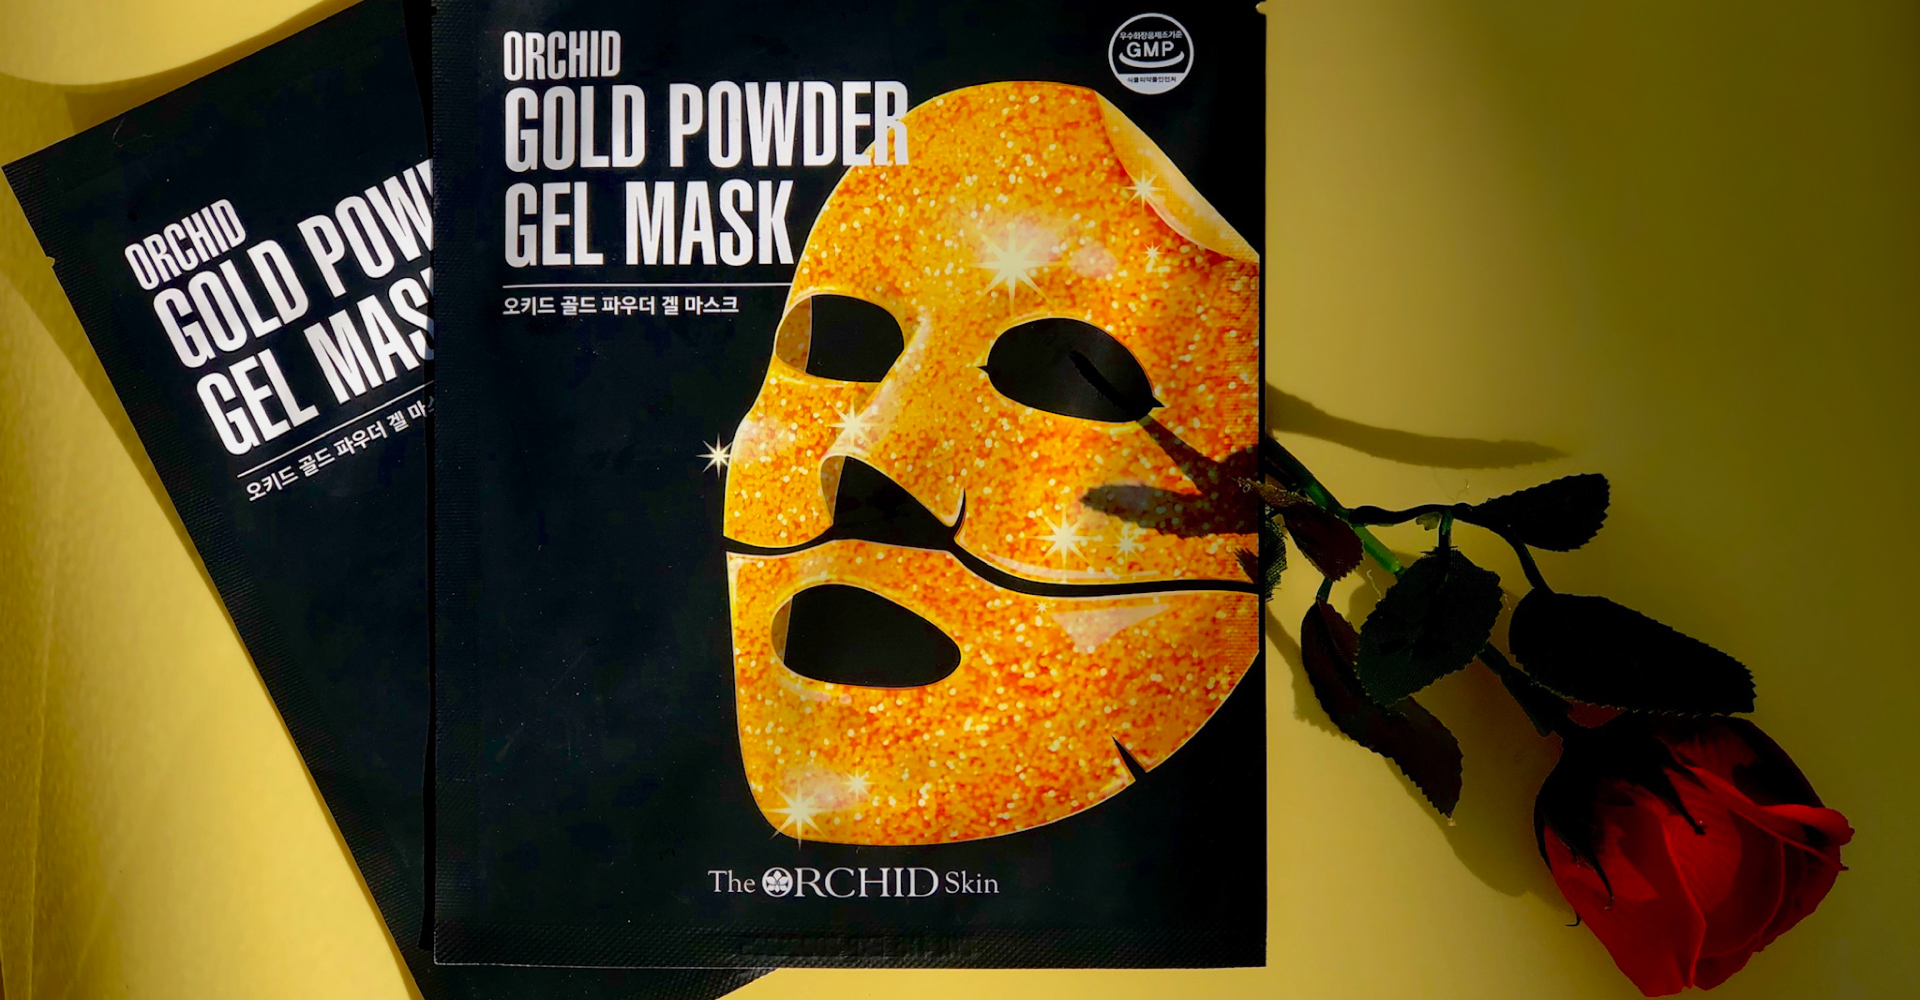 ORCHID Gold Powder Gel Mask